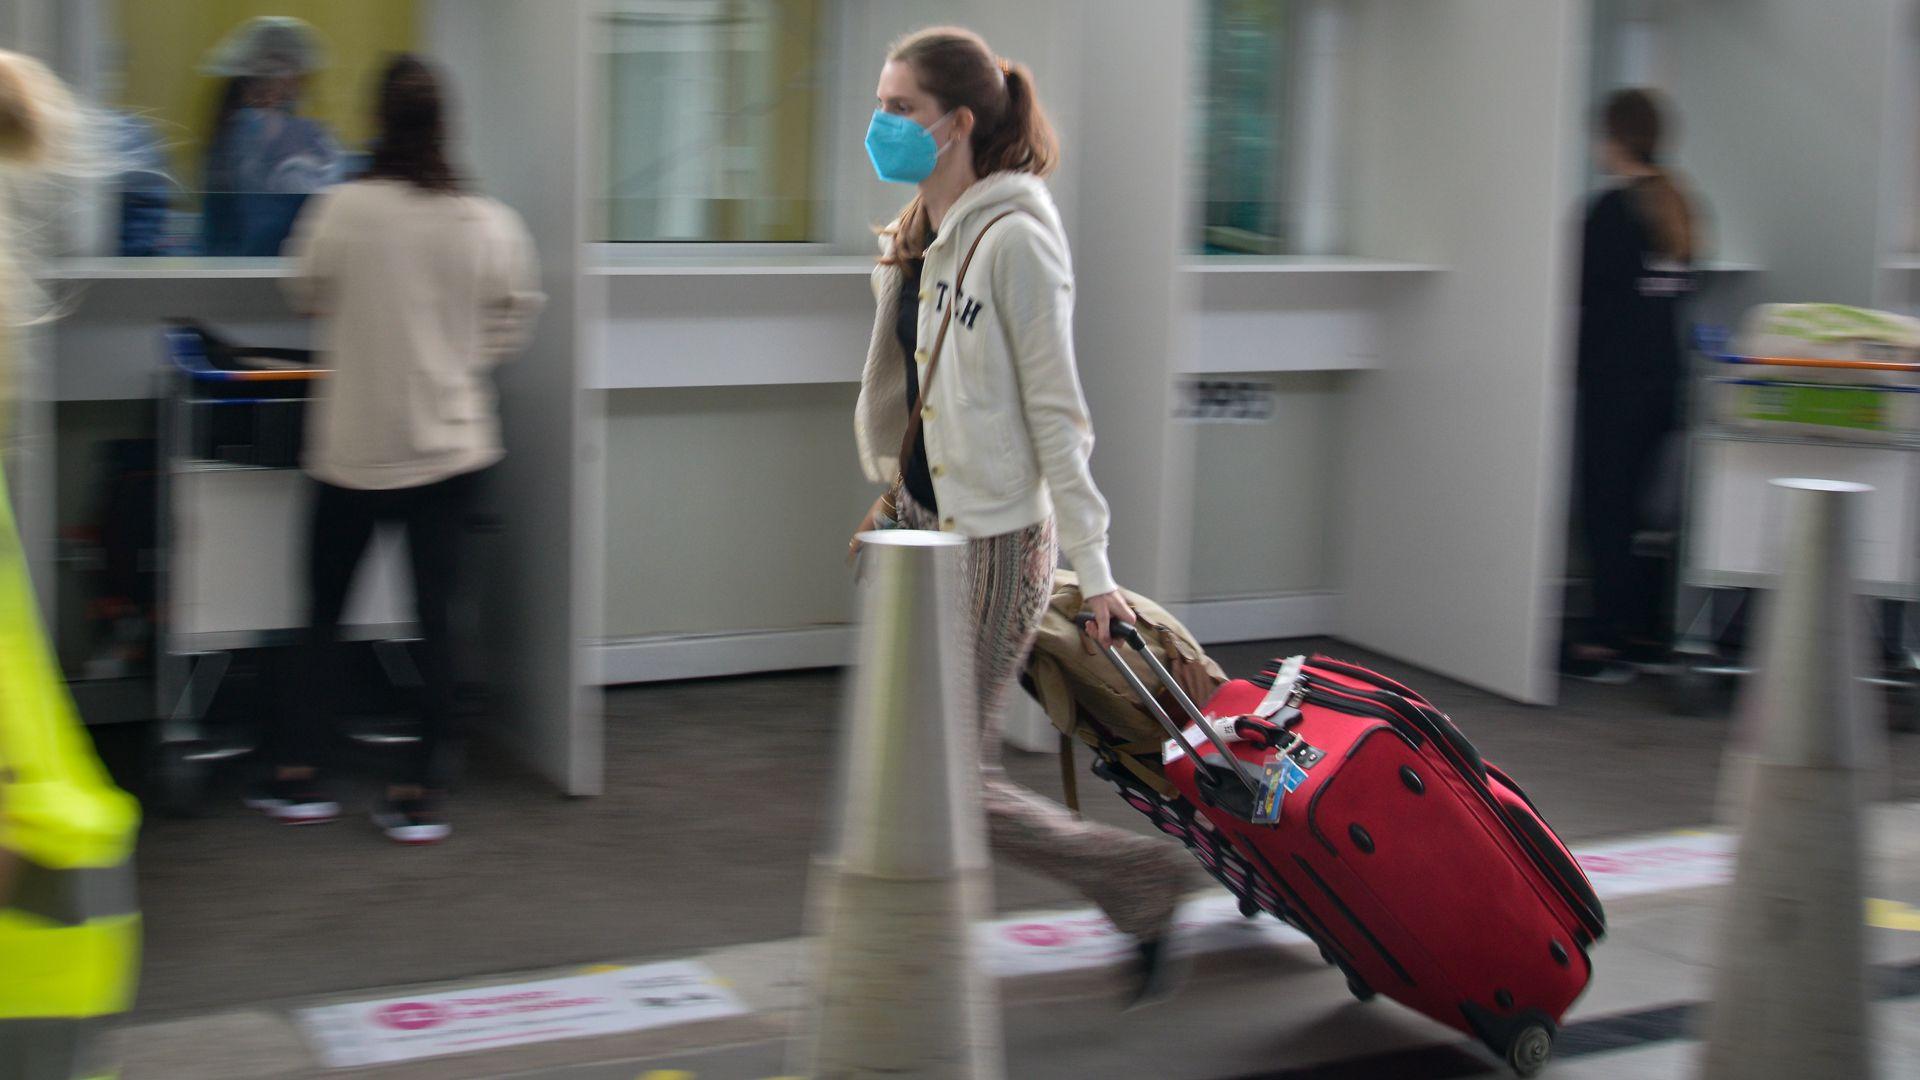 Test de saliva en Aeropuerto Ezeiza